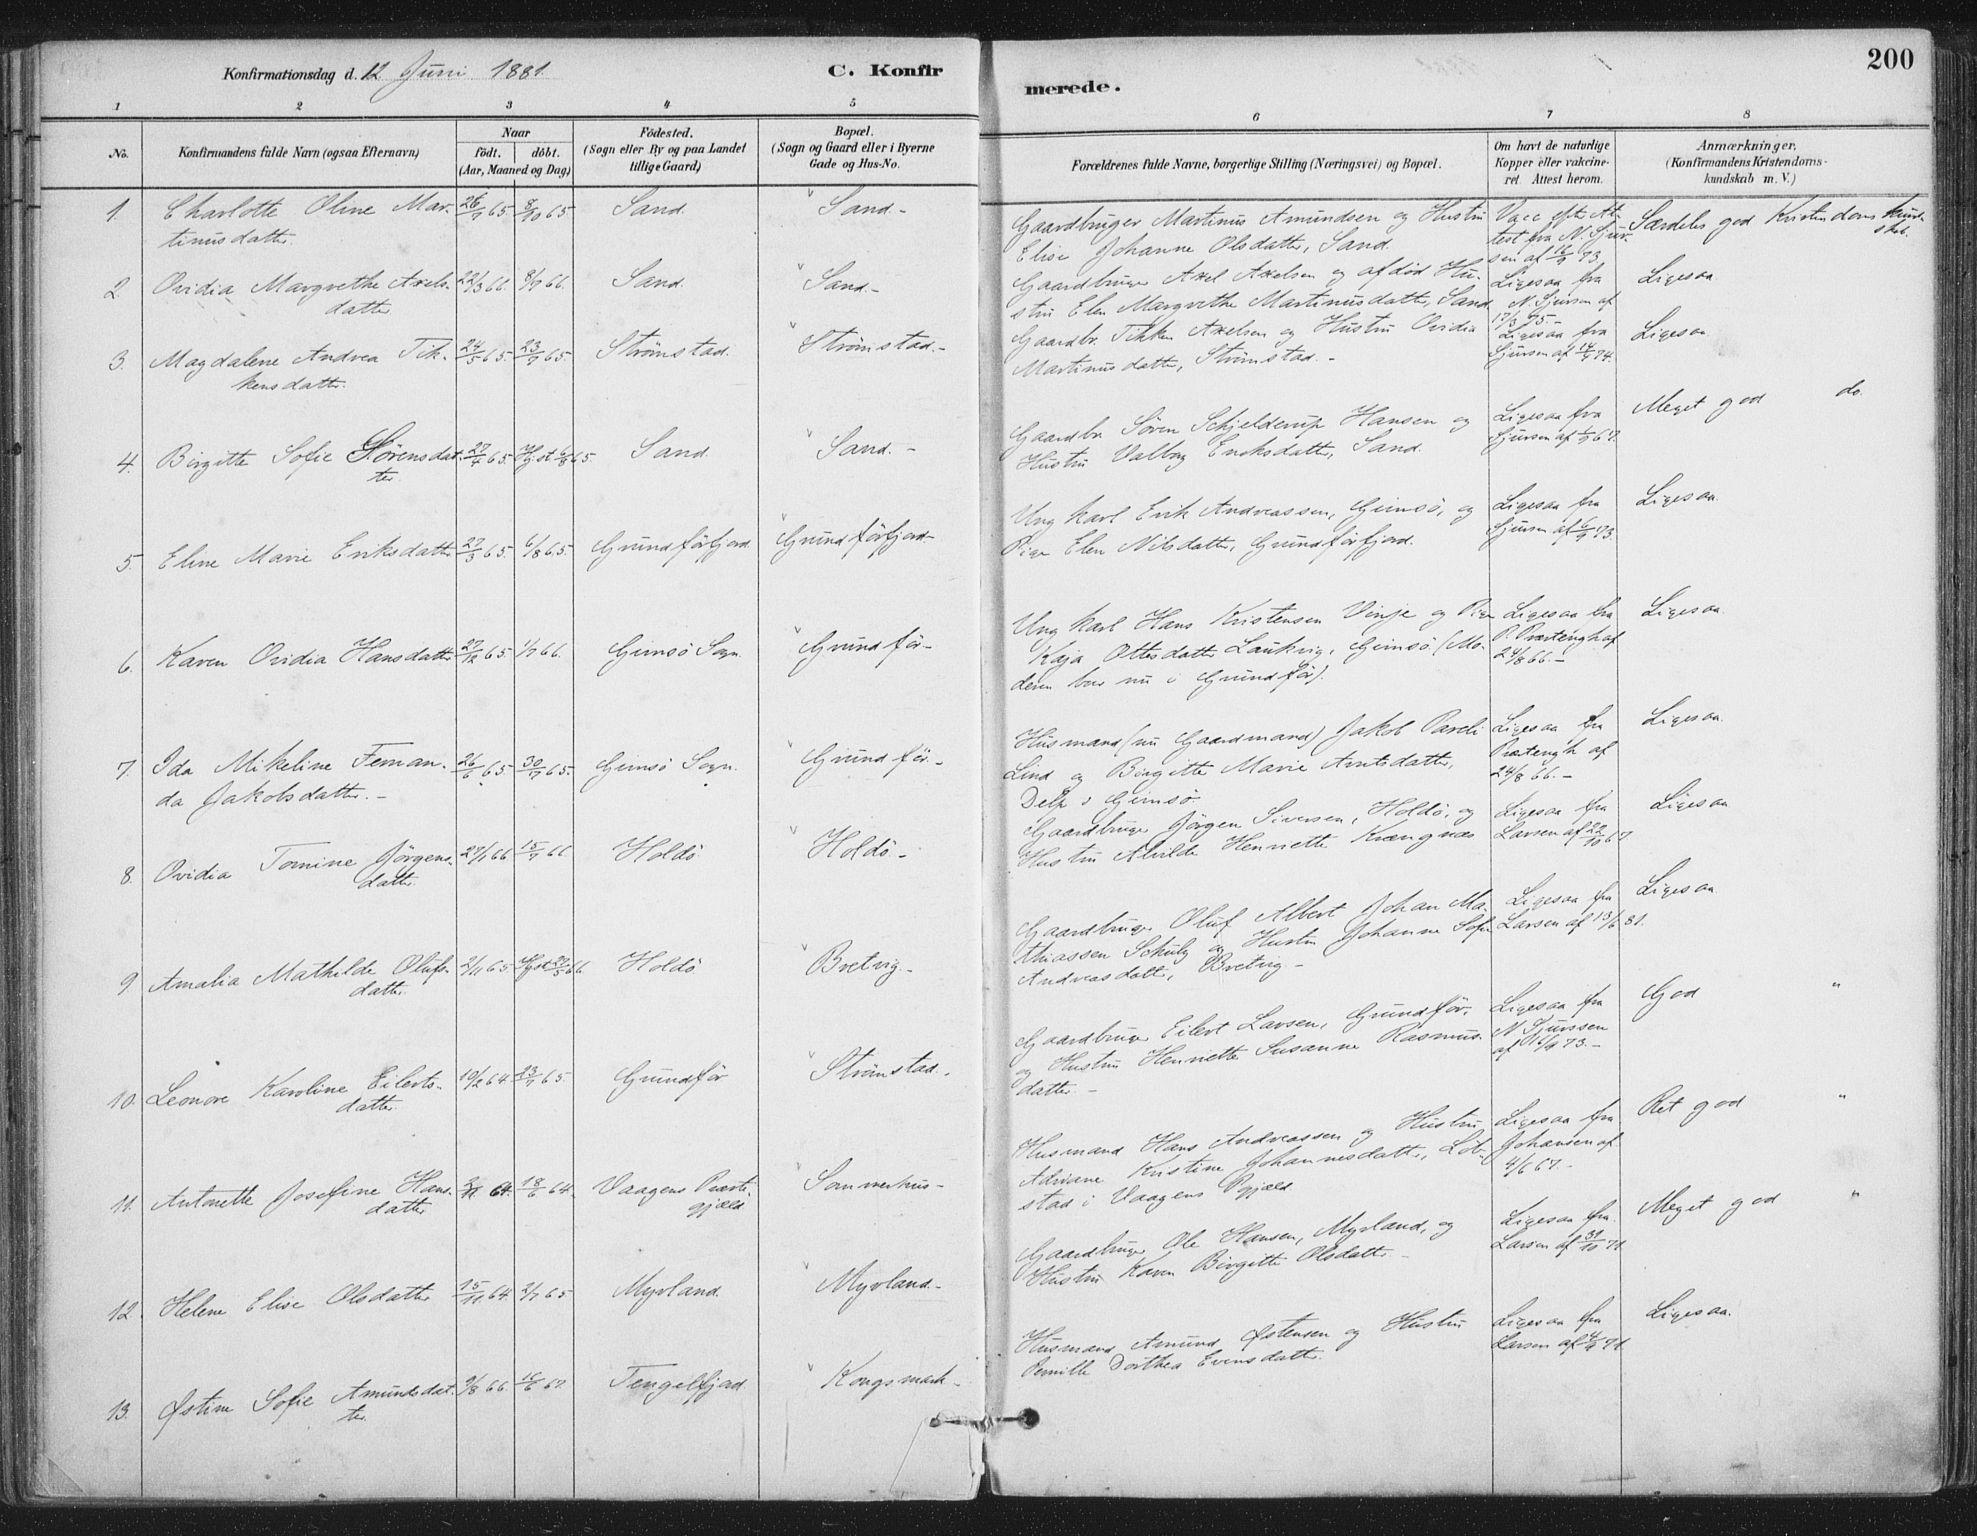 SAT, Ministerialprotokoller, klokkerbøker og fødselsregistre - Nordland, 888/L1244: Ministerialbok nr. 888A10, 1880-1890, s. 200